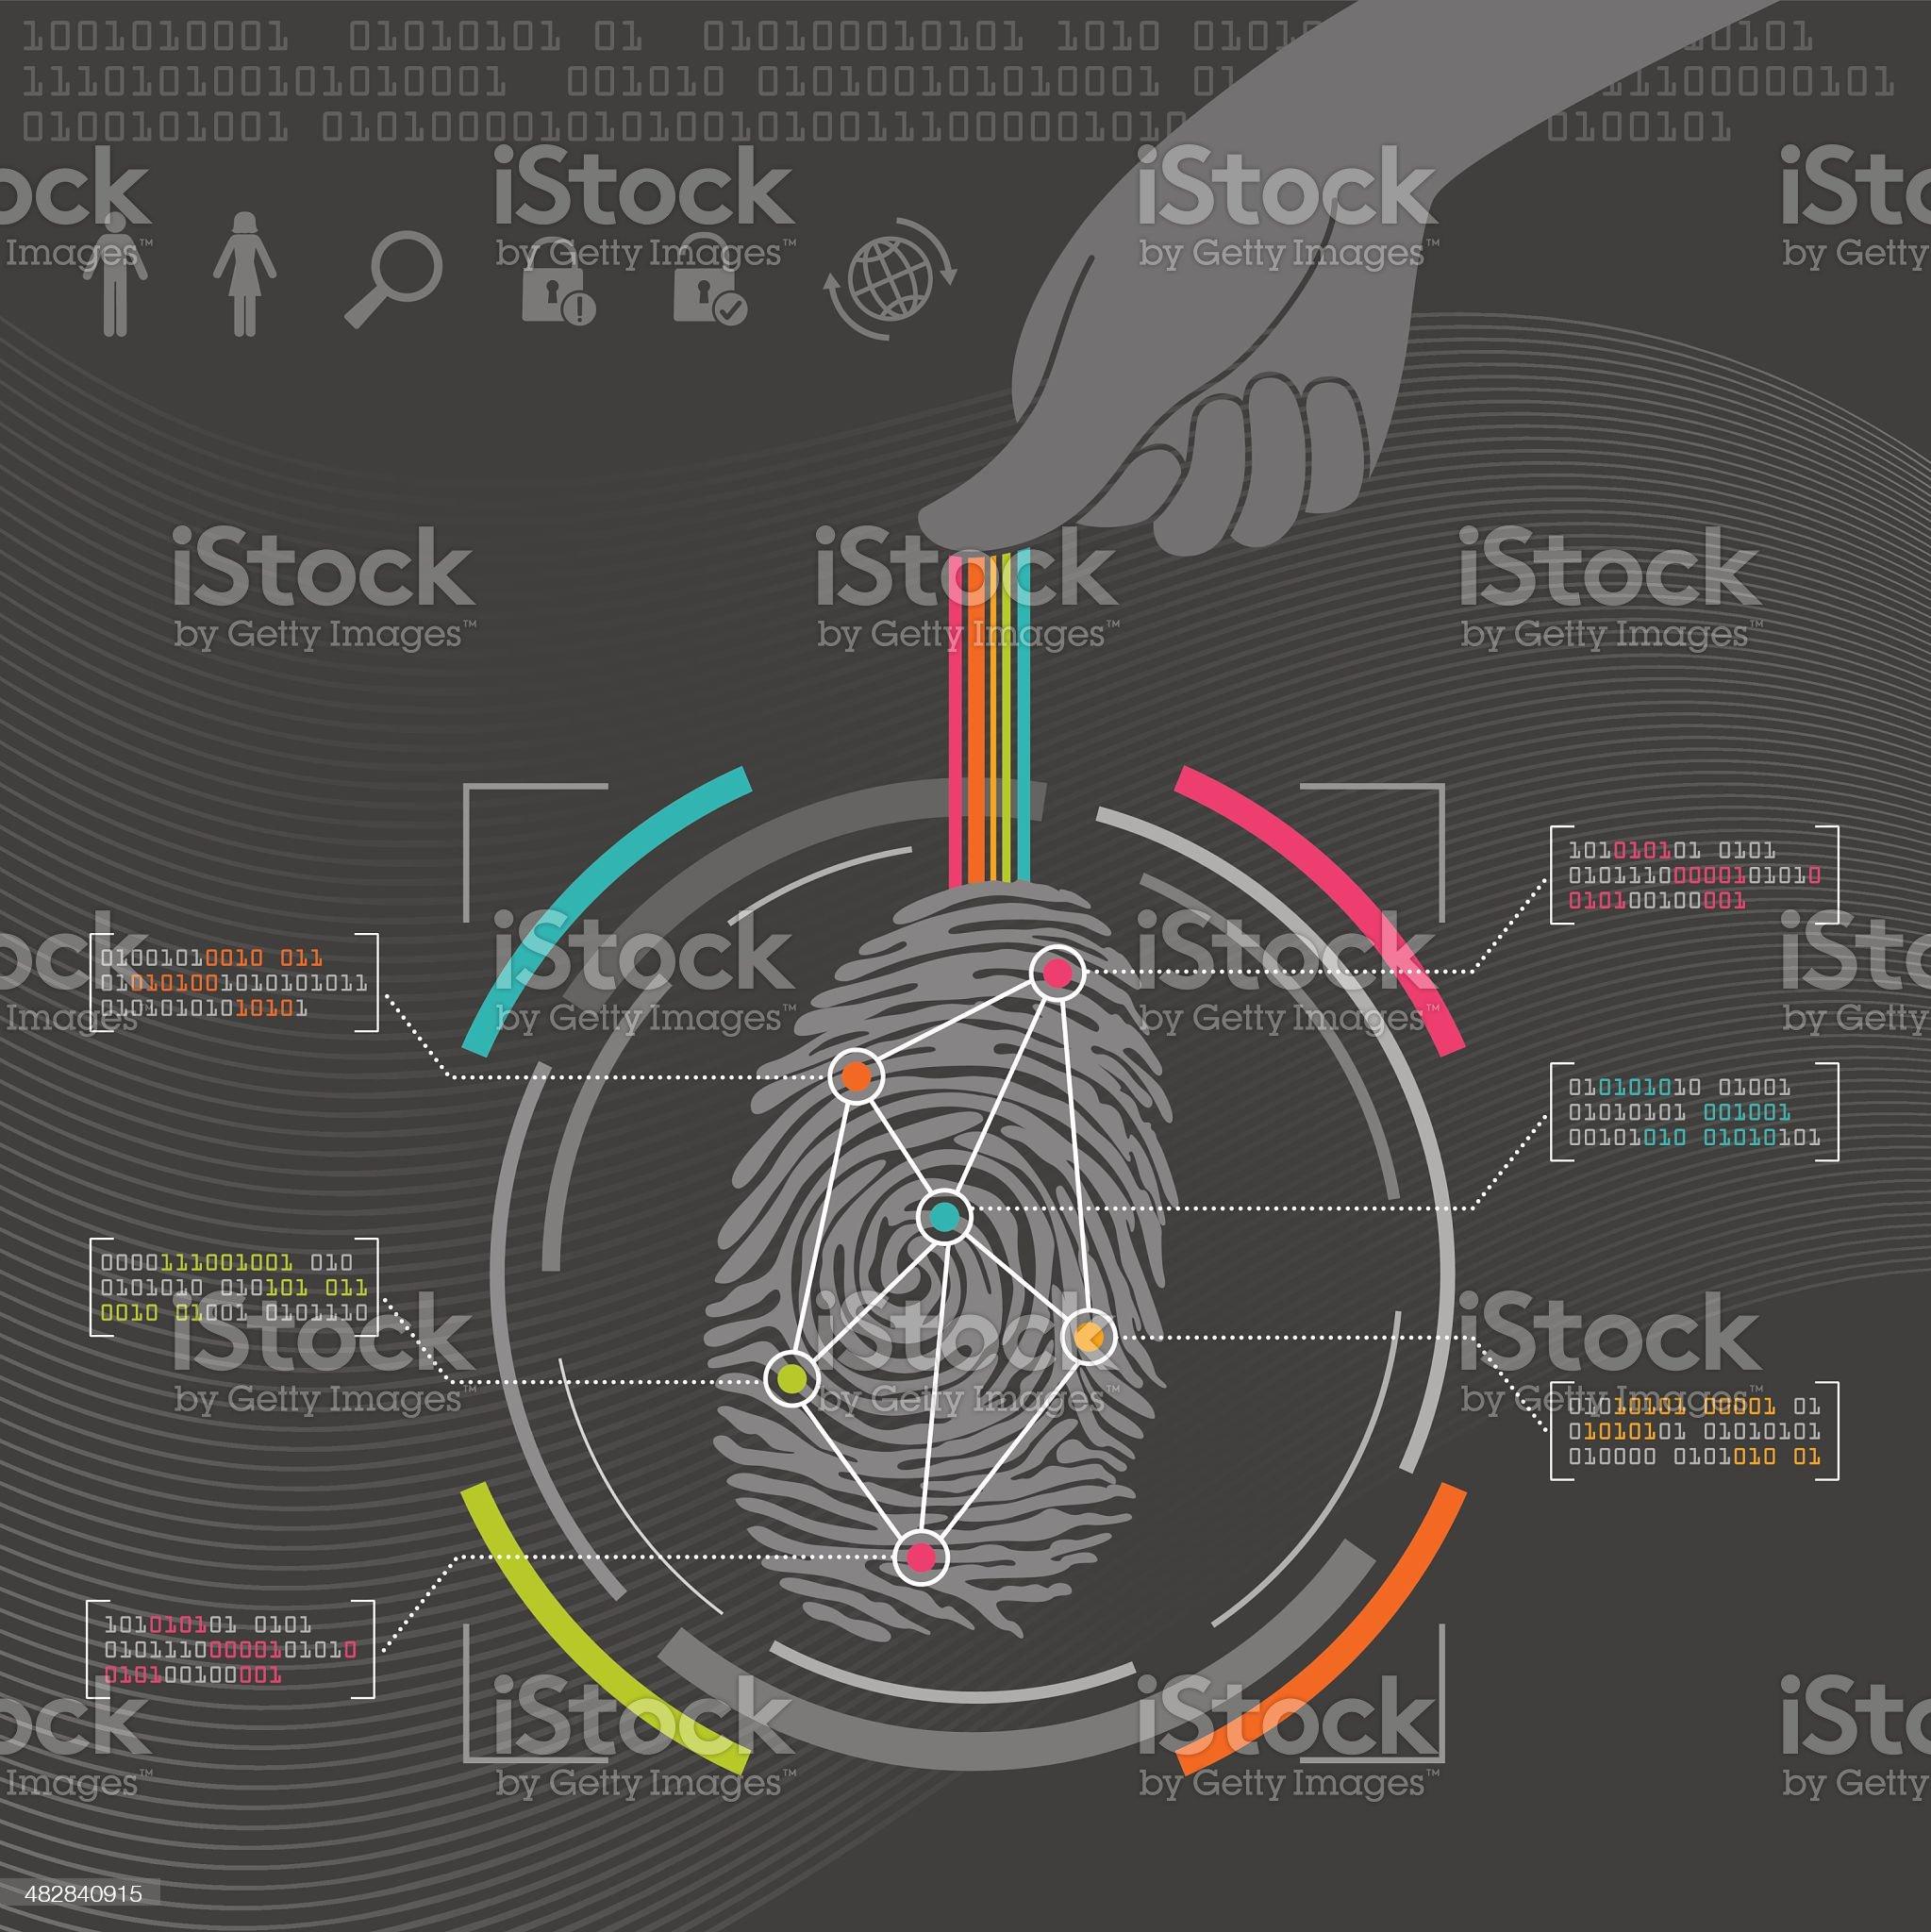 Fingerprint Biometrics royalty-free stock vector art